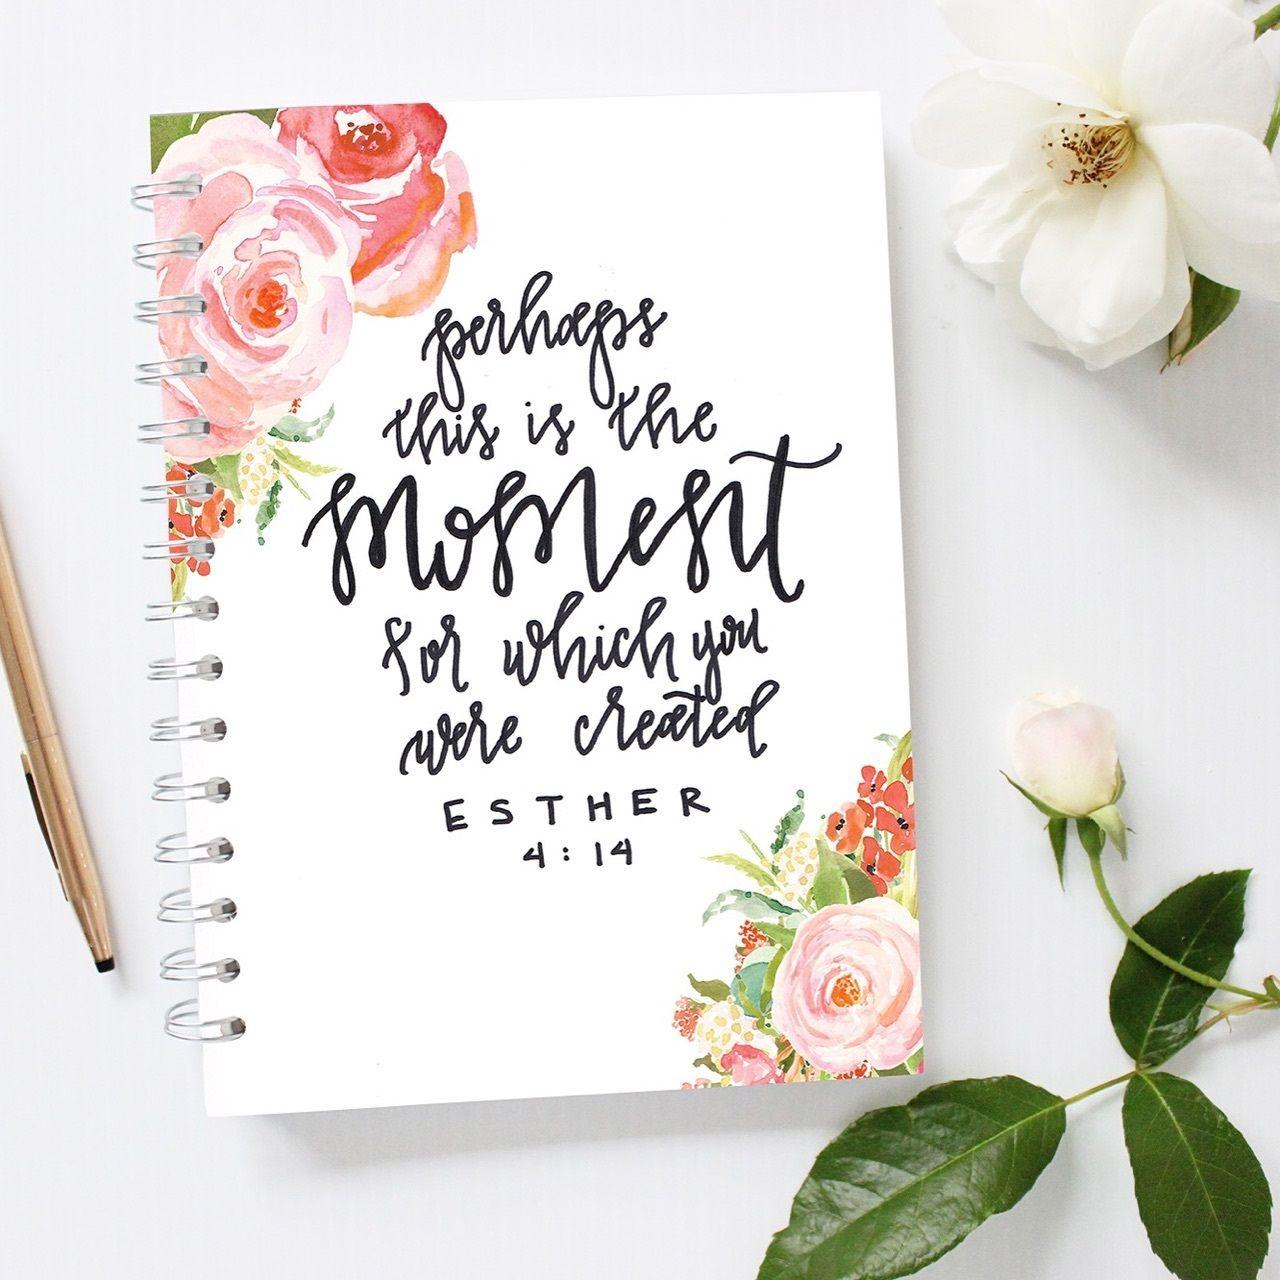 Esther 4:14 Journal | Esther 4 14, Soul scripts, Esther